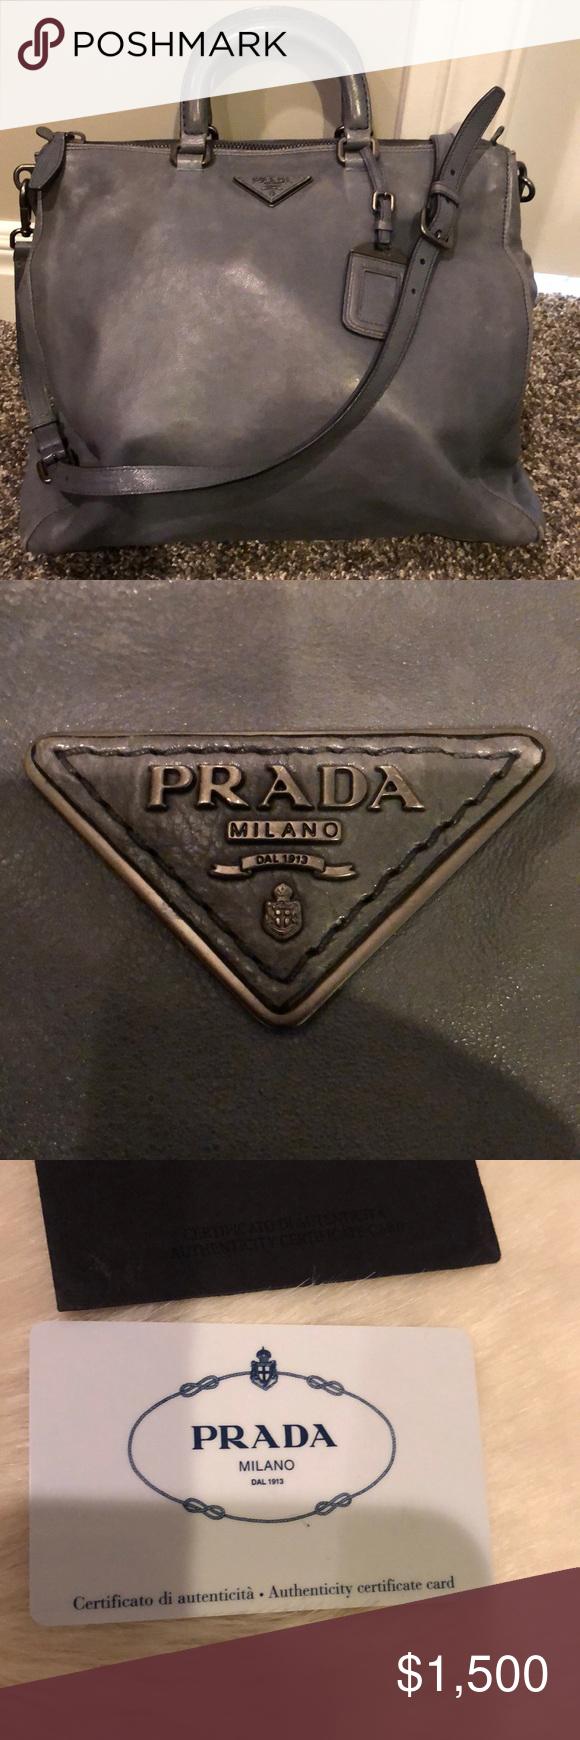 Photo of Authentic Prada handbag Authentic Prada handbag with Authenticity certificate ca…